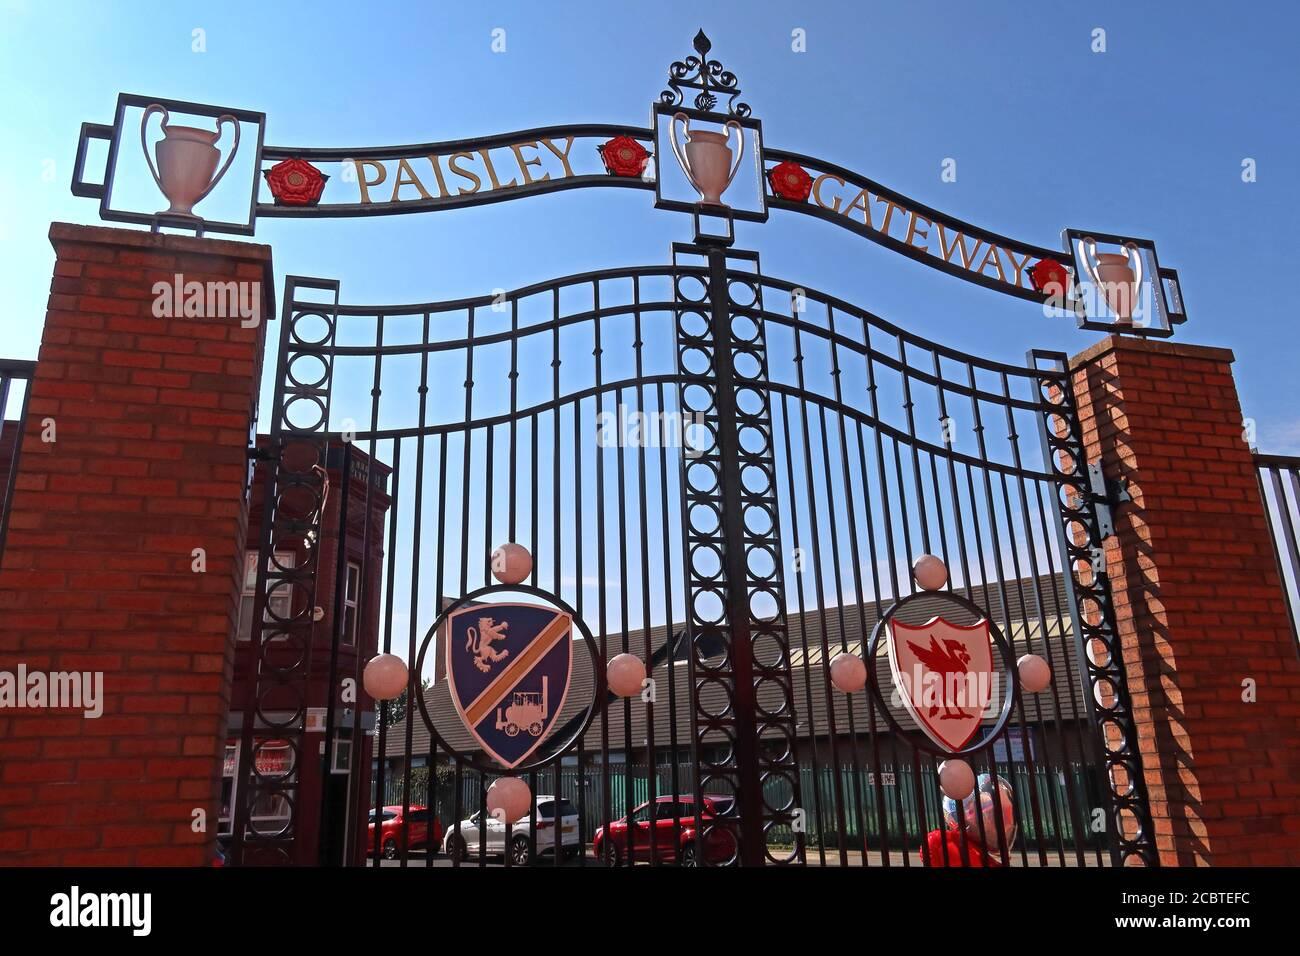 GoTonySmith,HotpixUK,@HotpixUK,England,UK,Britain,Great Britain,Liverpool,city centre,Merseyside,L4,Ground,Stadia,Stadium,Youll Never walk alone,Never Walk alone,reds,the reds,football,Premier League,gate,gates,Gateway,OBE